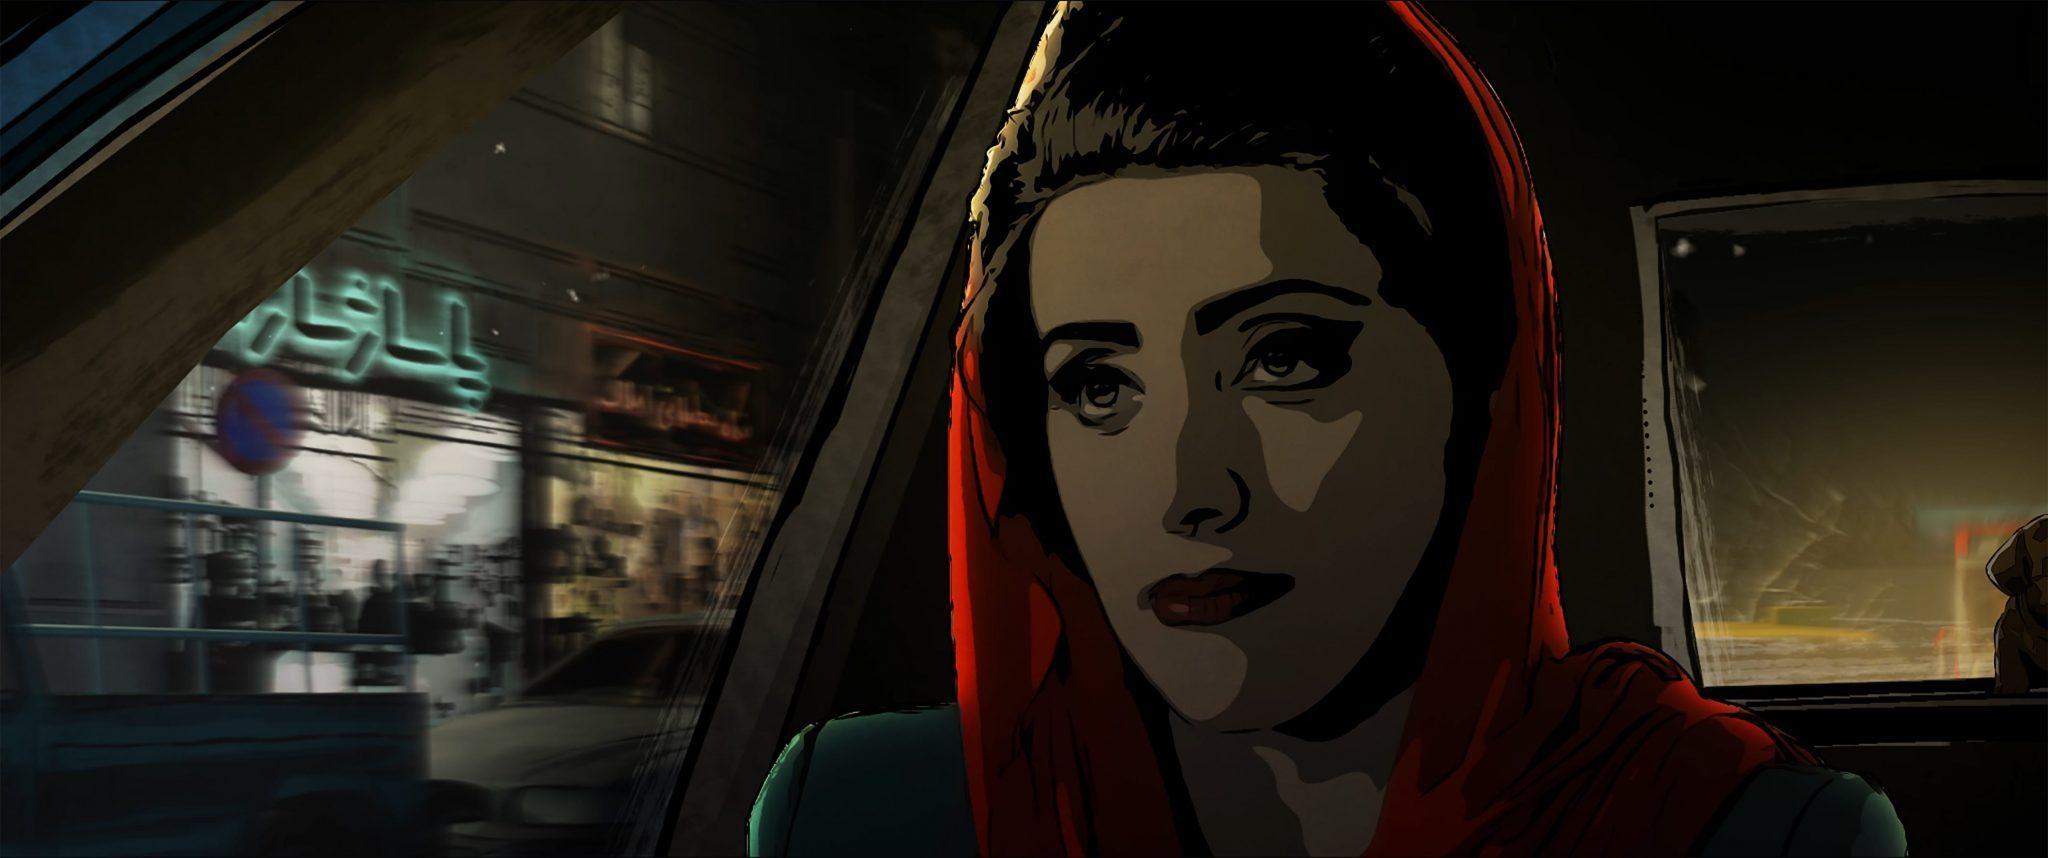 Festival international du film d'animation d'Annecy 2017 image Téhéran tabou